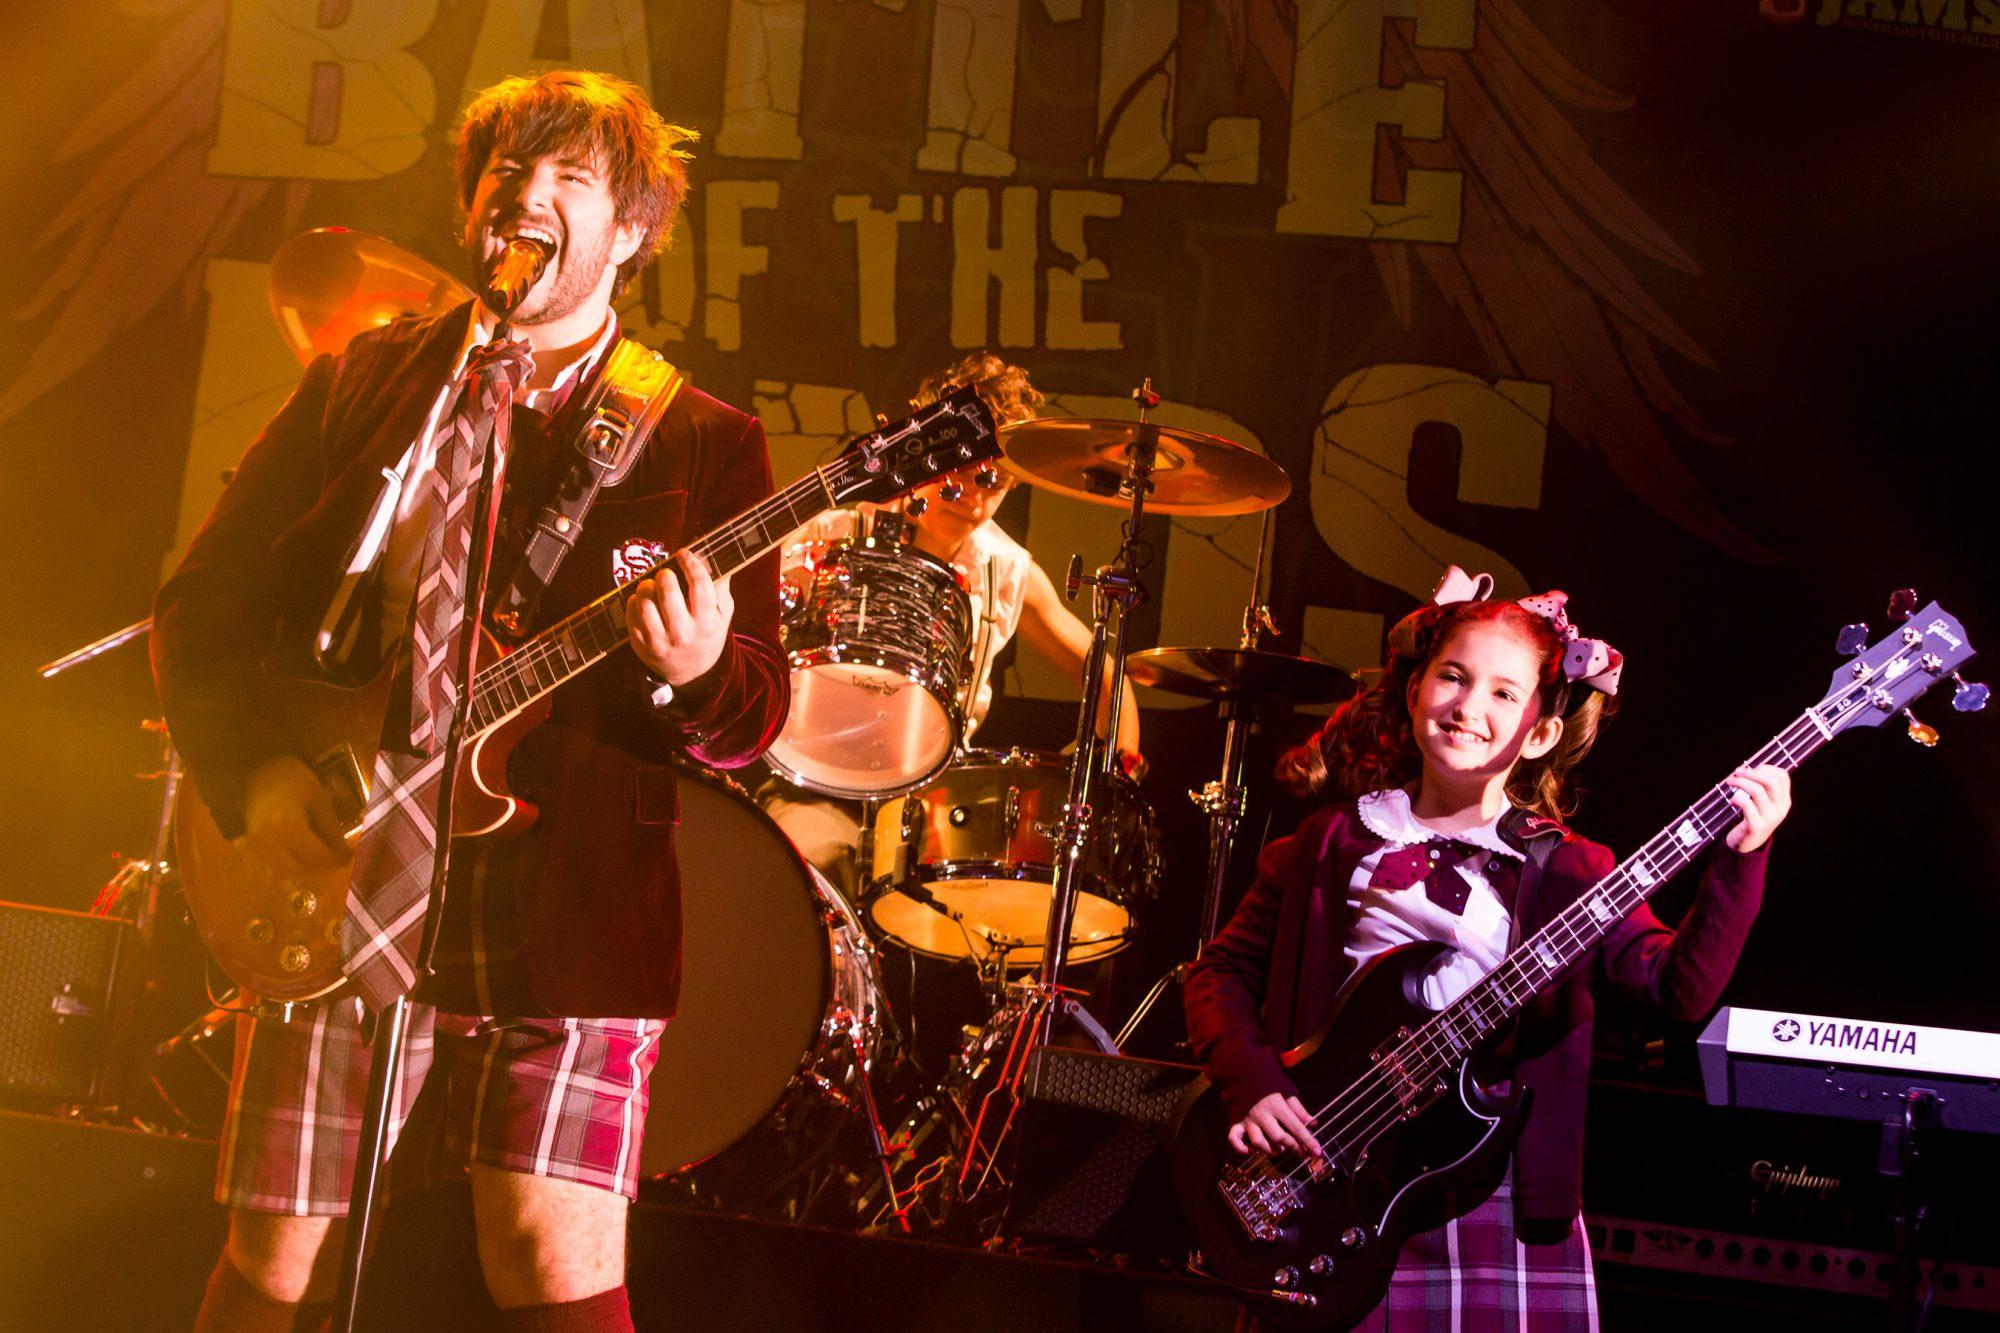 School of Rock ñ The MusicalAlex Brightman, Dante Melucci, and Evie Dolan